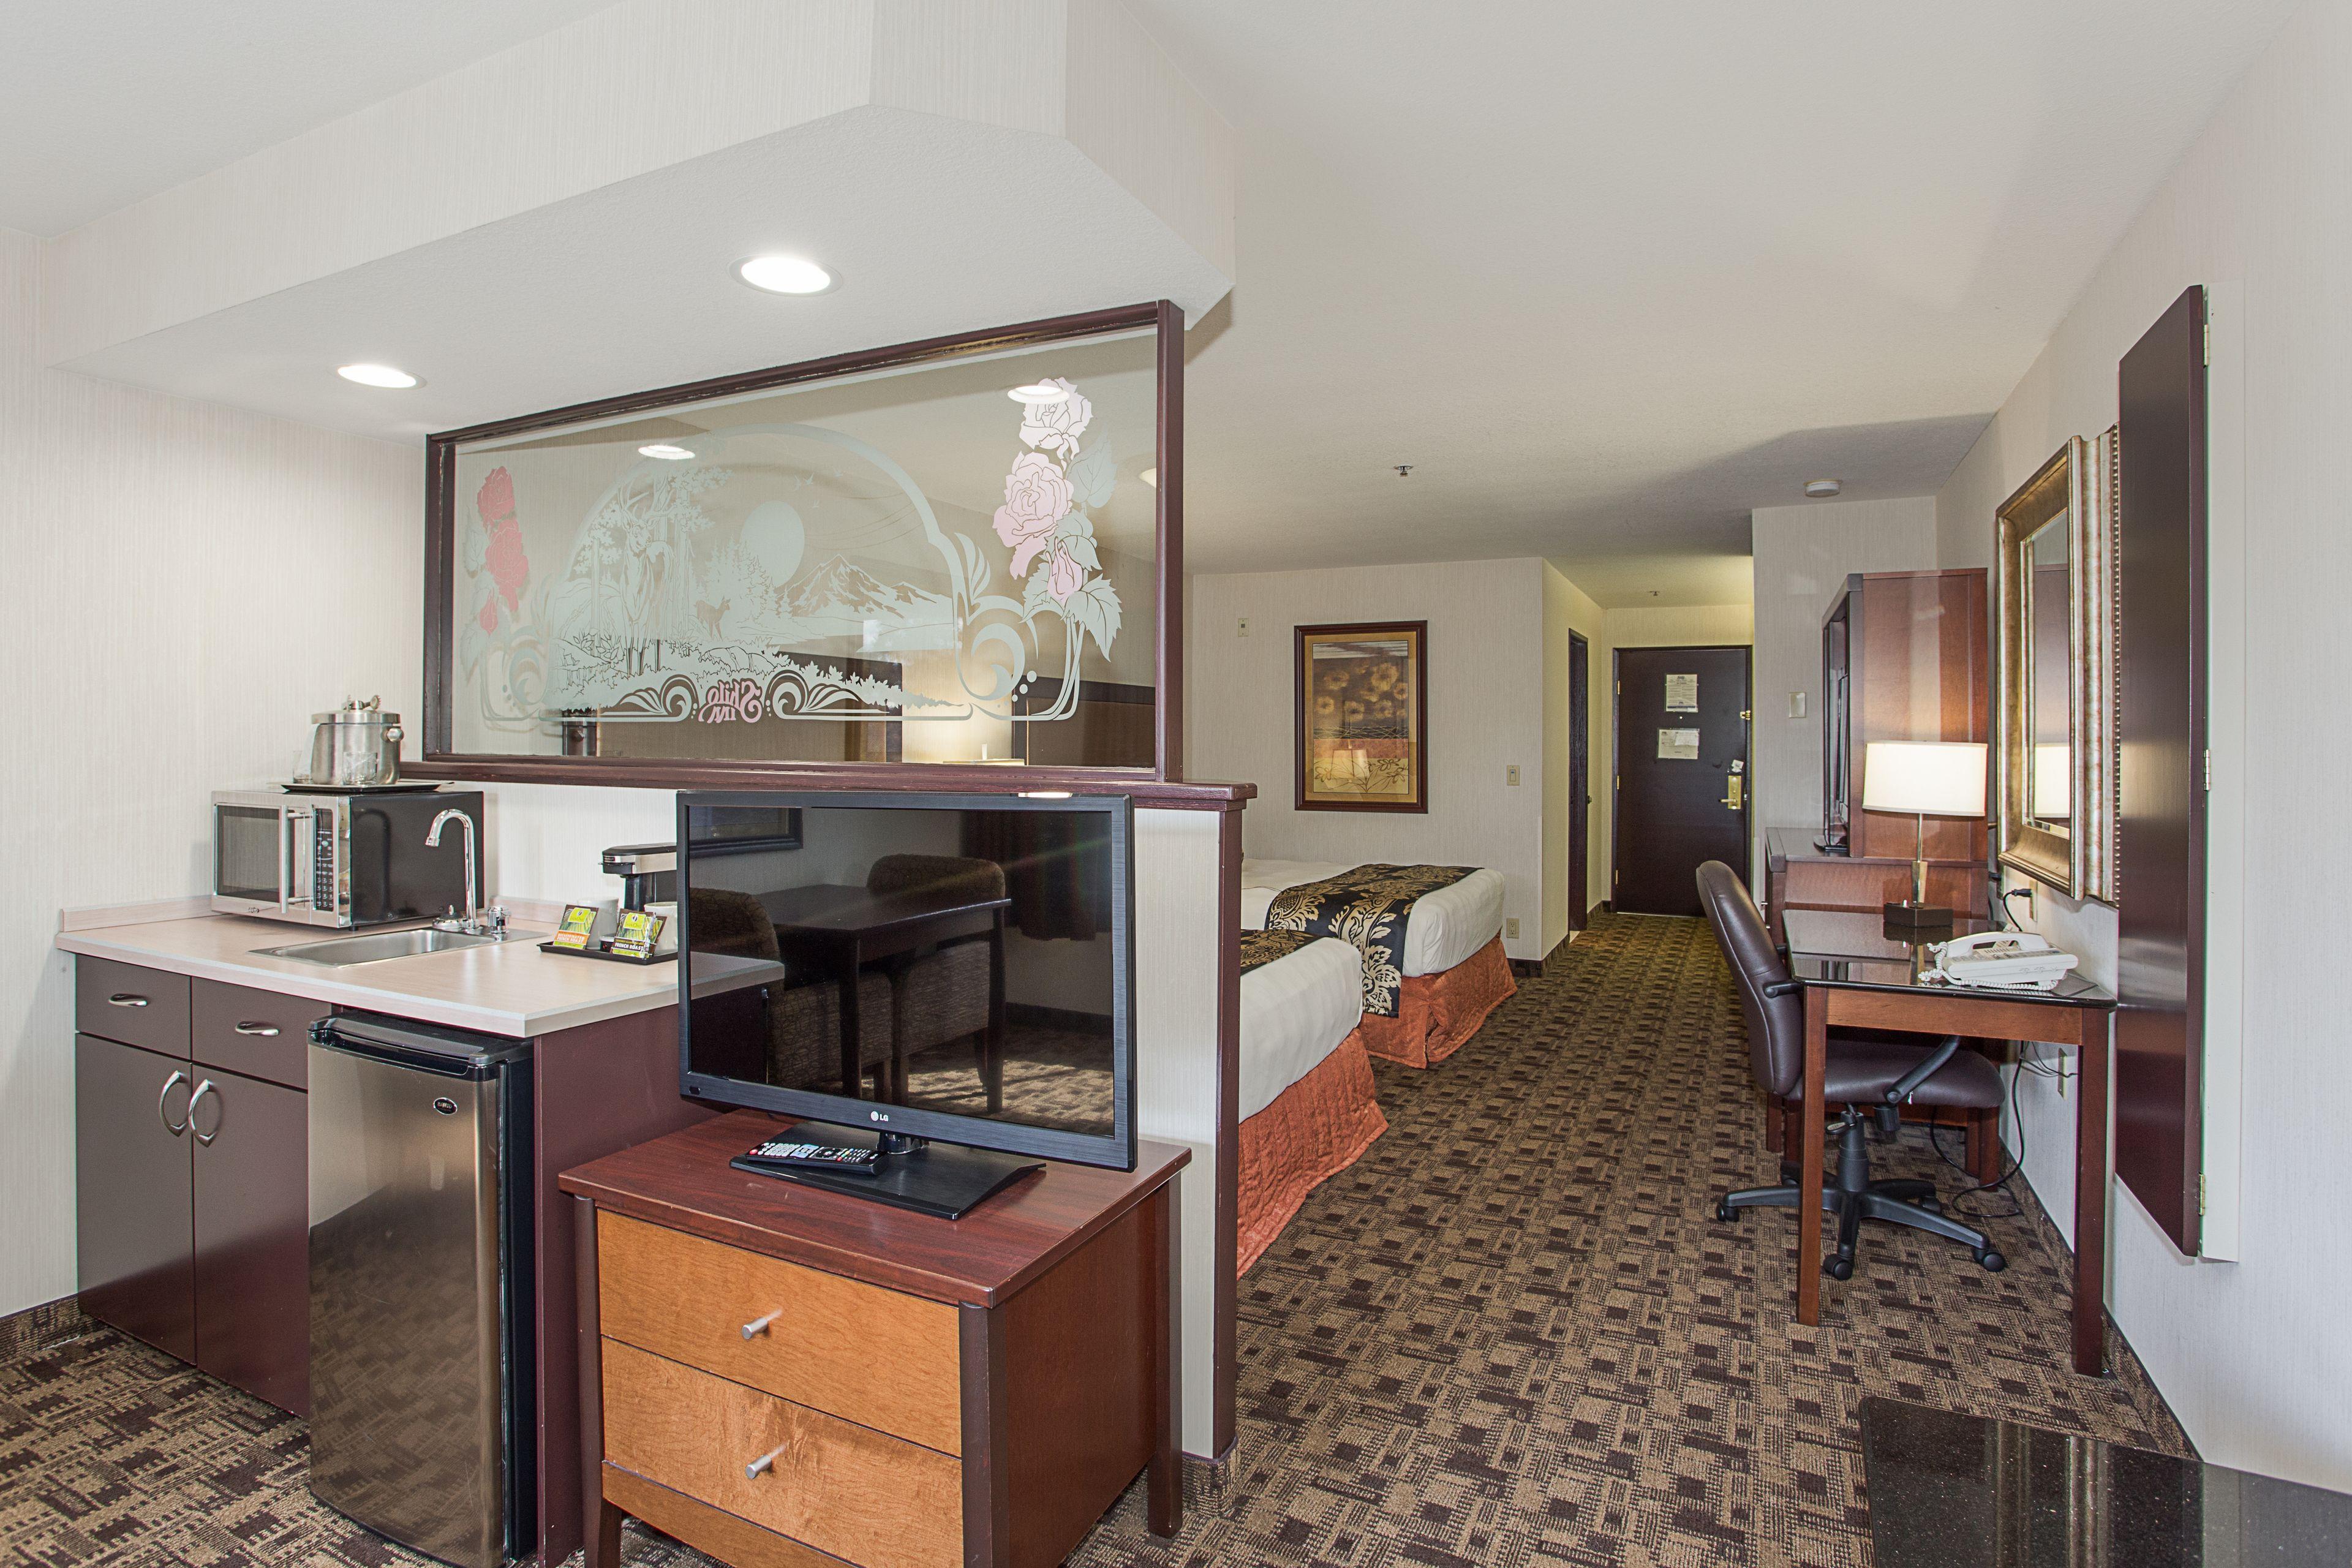 Courtesy of Shilo Inn Suites Hotel, Portland Airport / Expedia